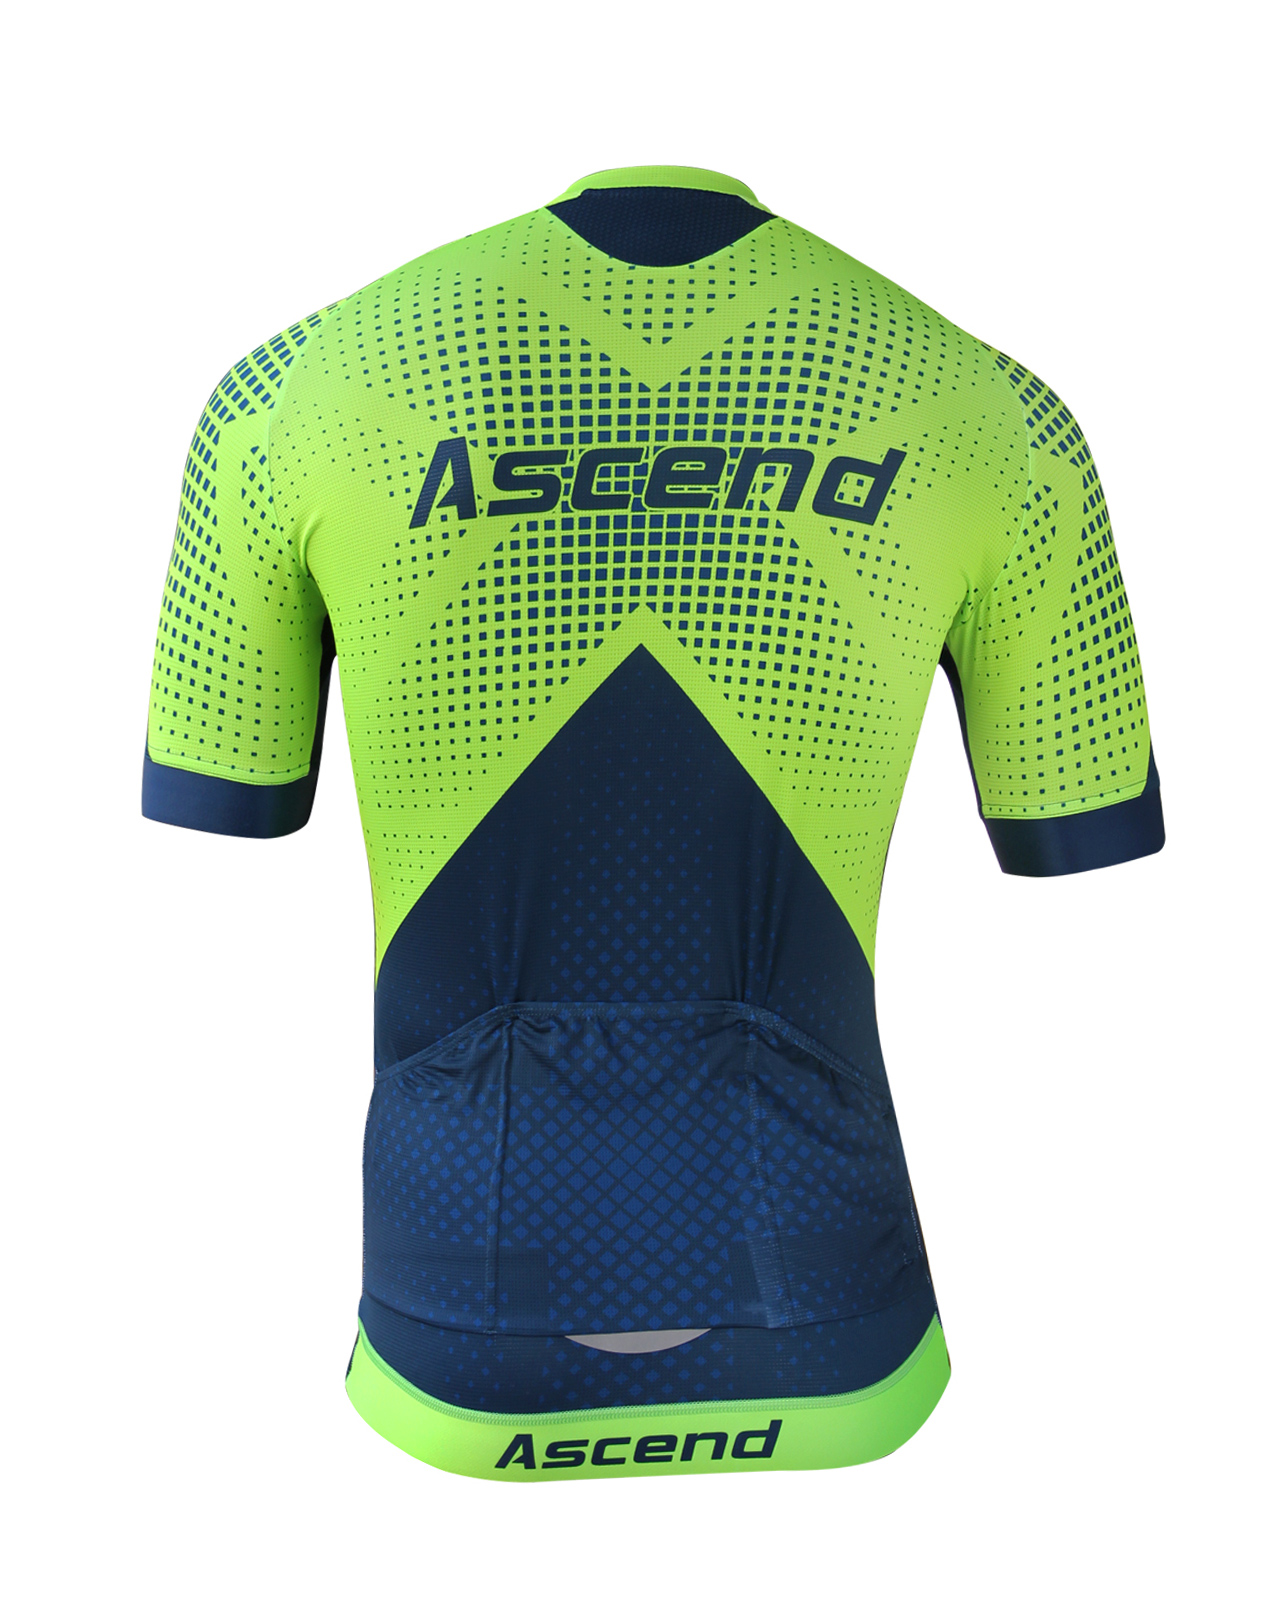 9ef7a4c917c APEX Elite Custom Cycling Jersey - Ascend Sportswear